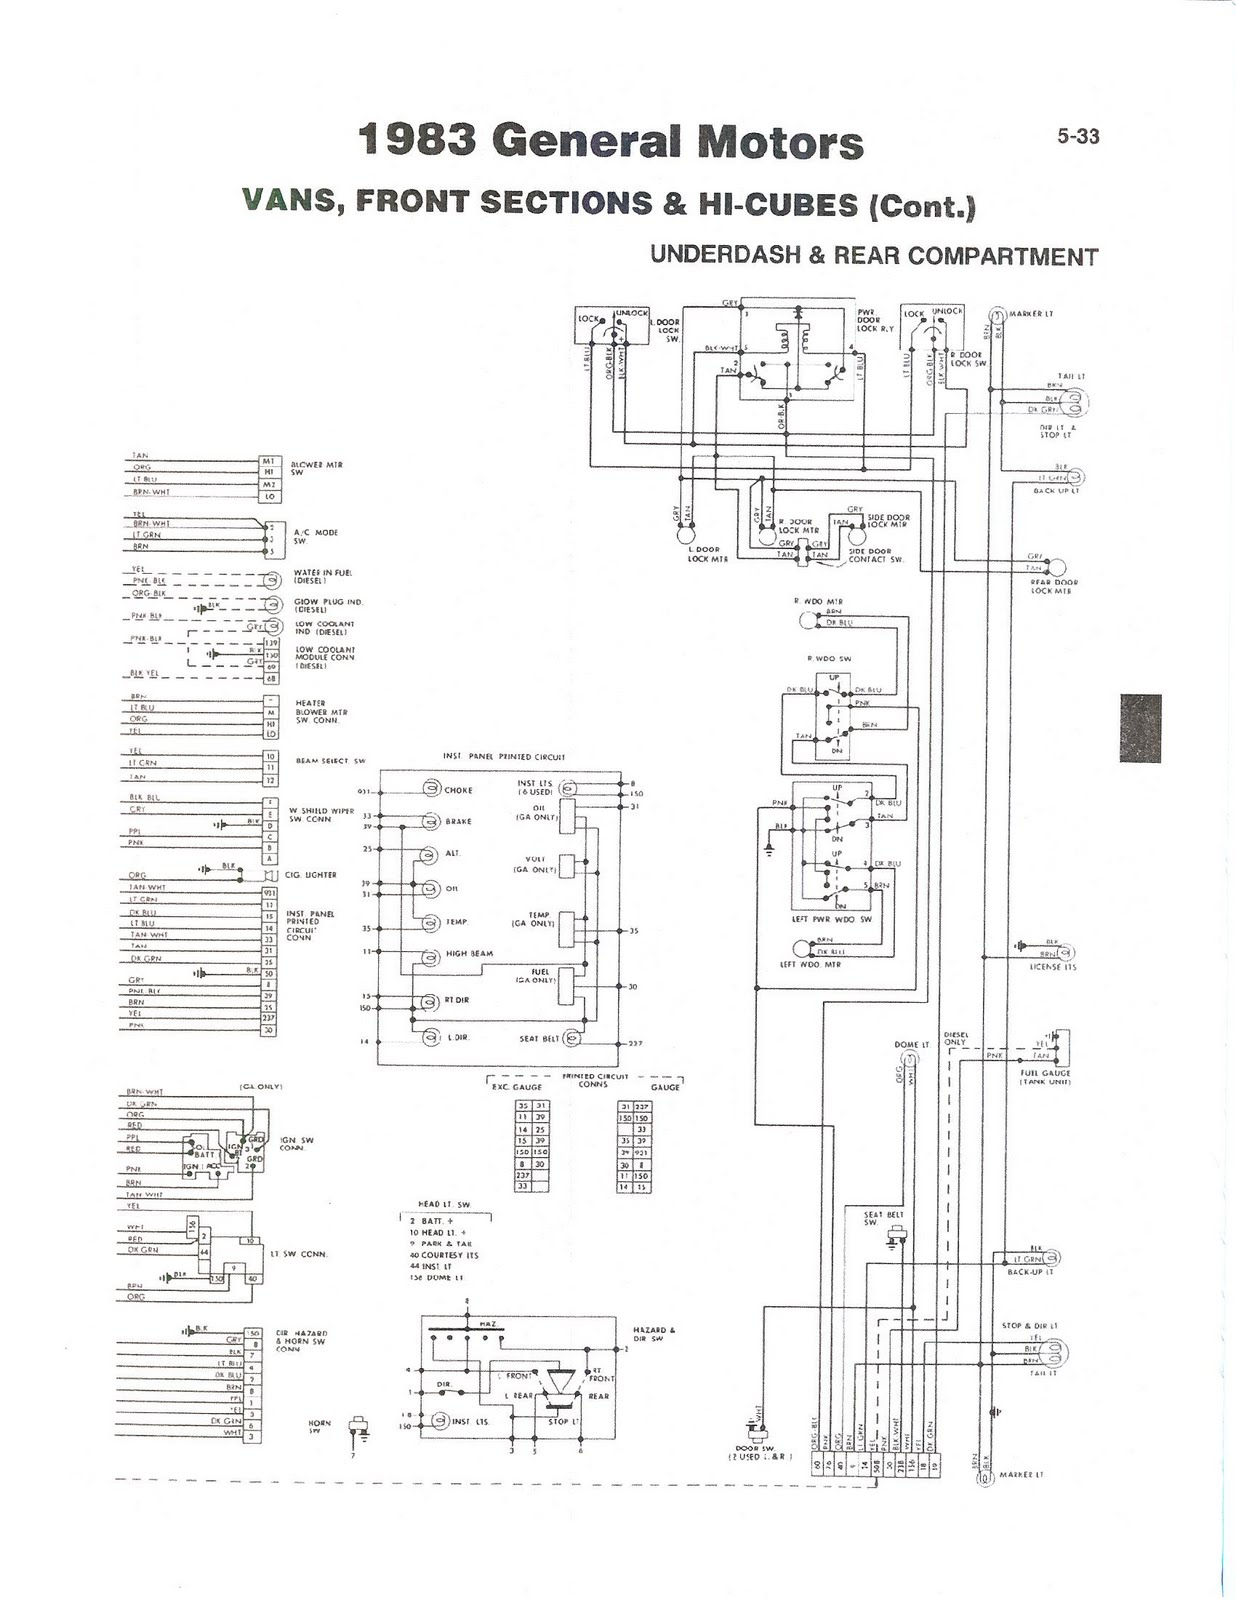 Fleetwood Prowler Travel Trailer Wiring Diagram Battery Dolgularcom